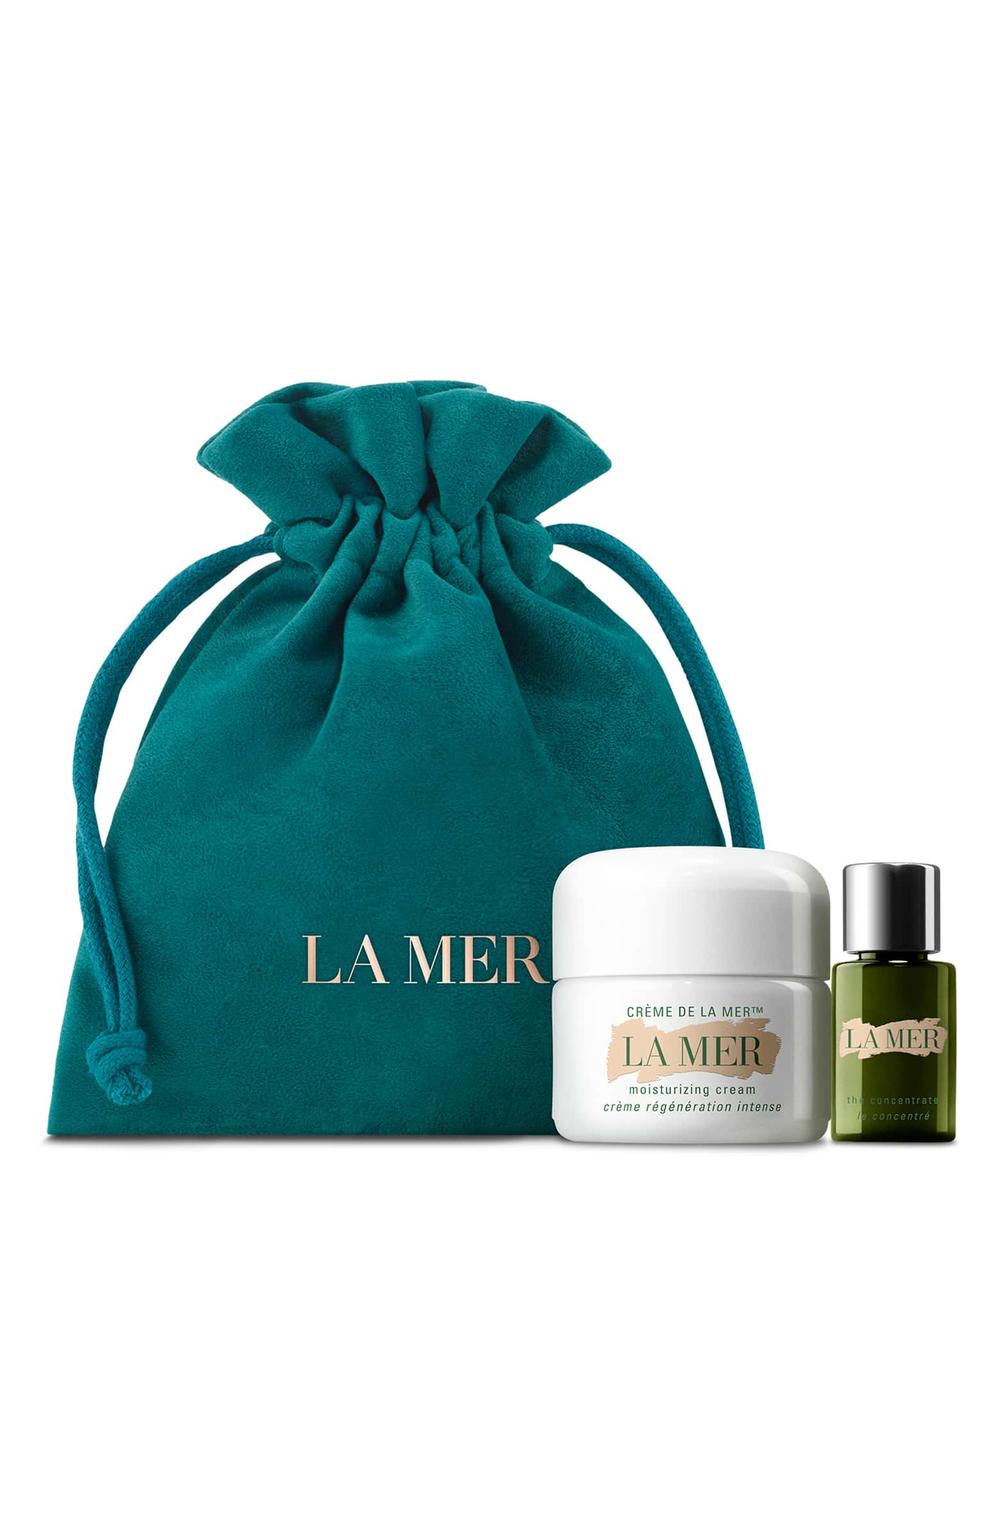 La Mer Travel Set - Cult-favorites from La Mer Skincare